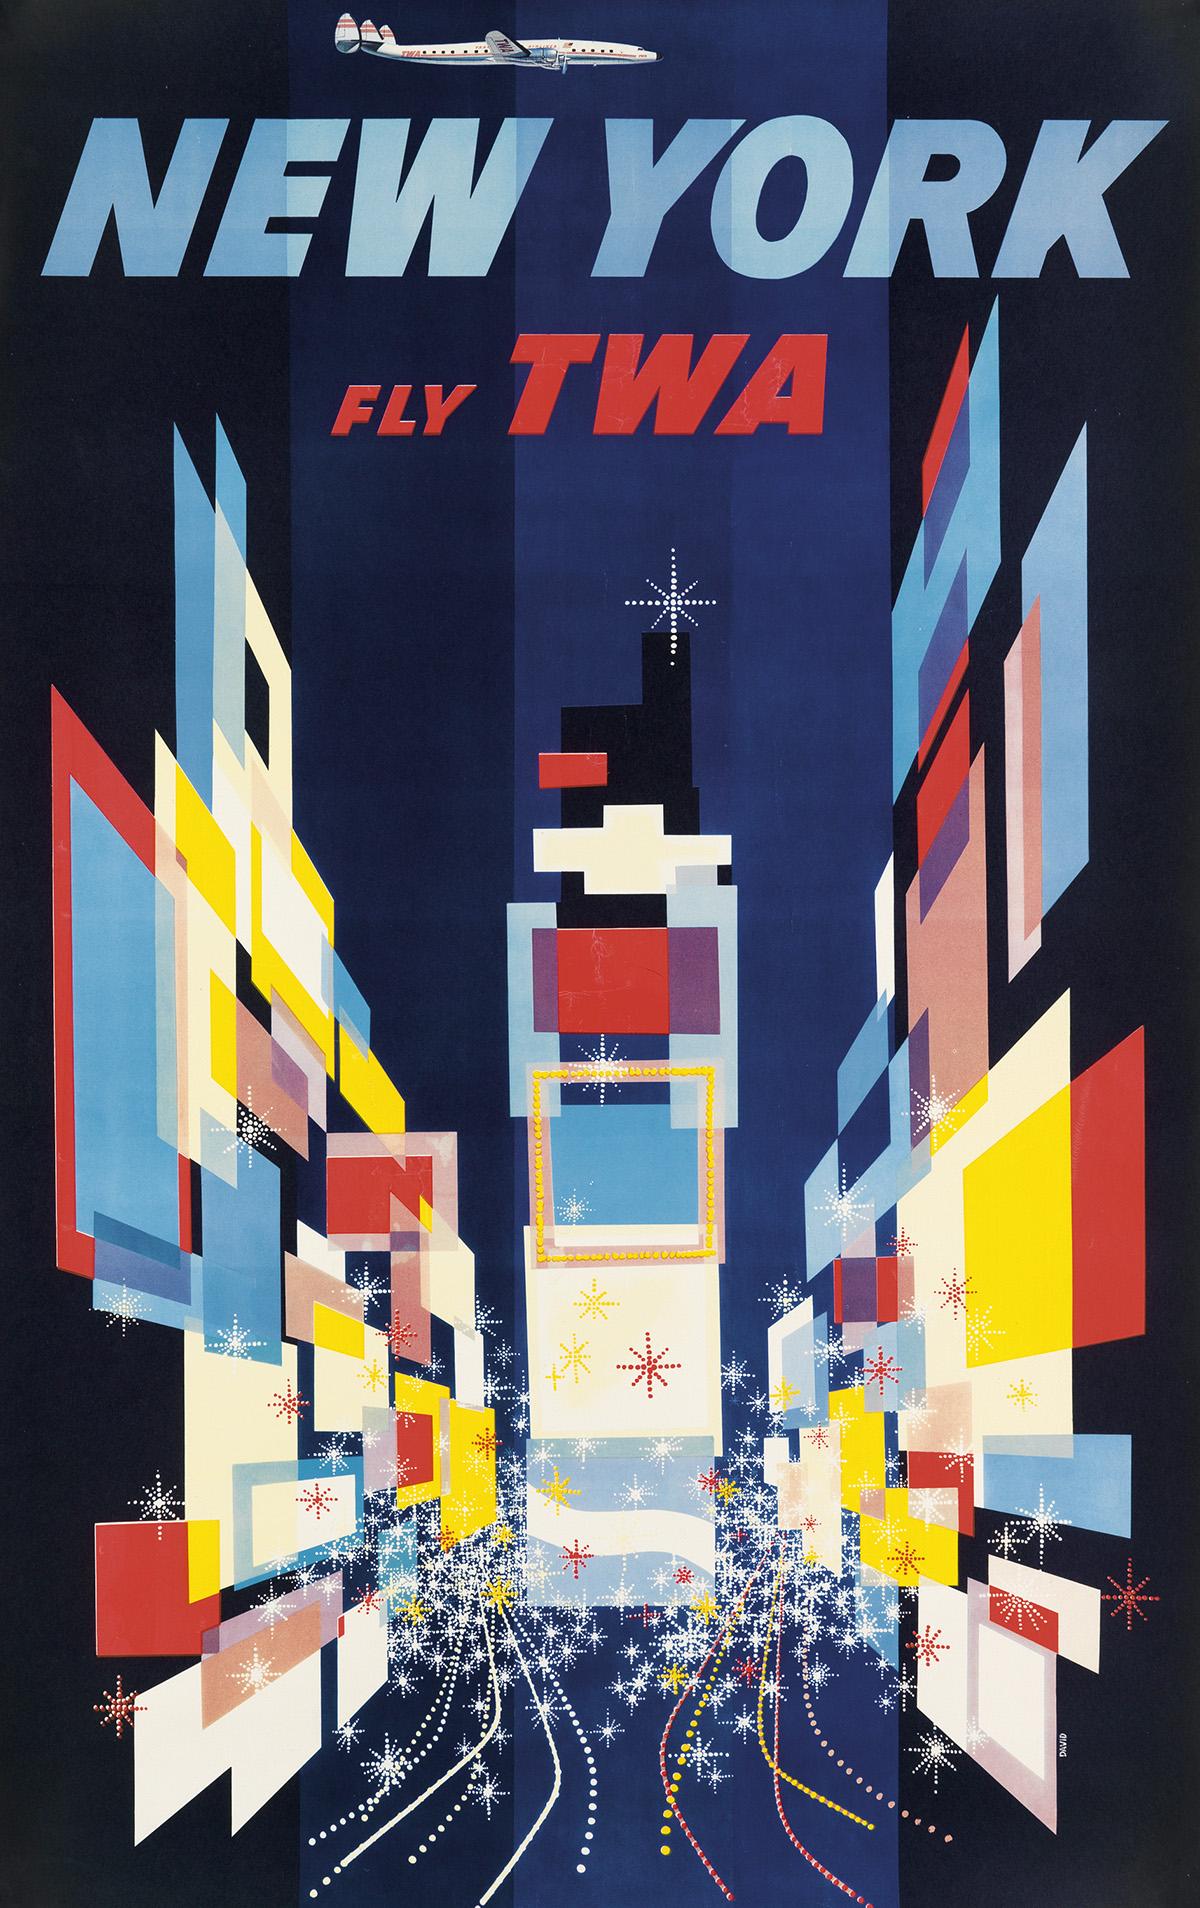 DAVID-KLEIN-(1918-2005)-NEW-YORK--FLY-TWA-1956-39x24-inches-